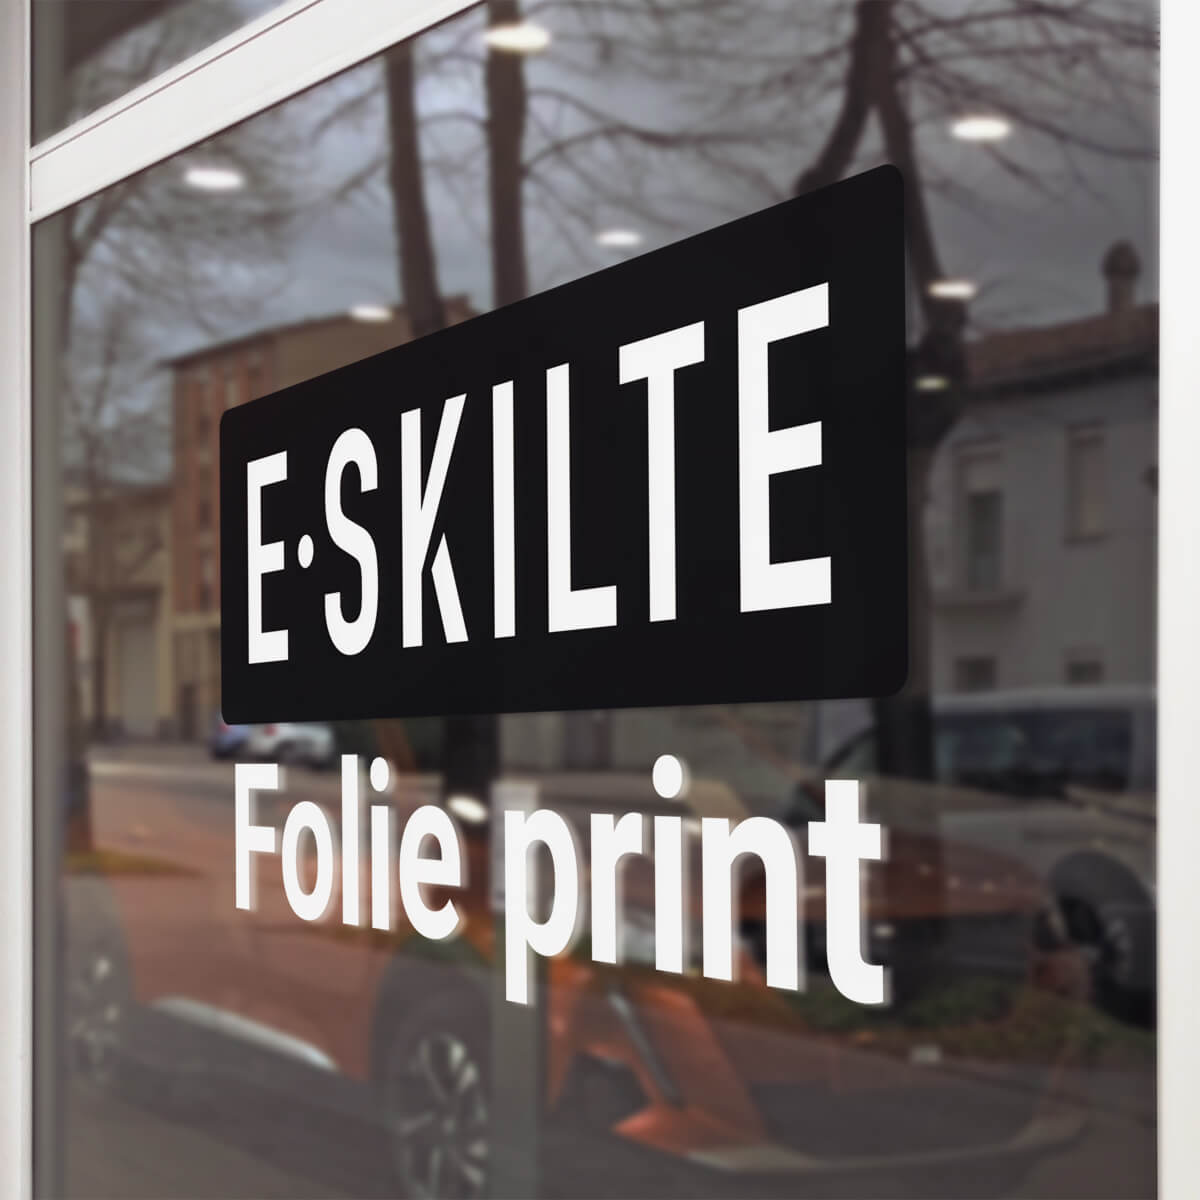 Folieprint